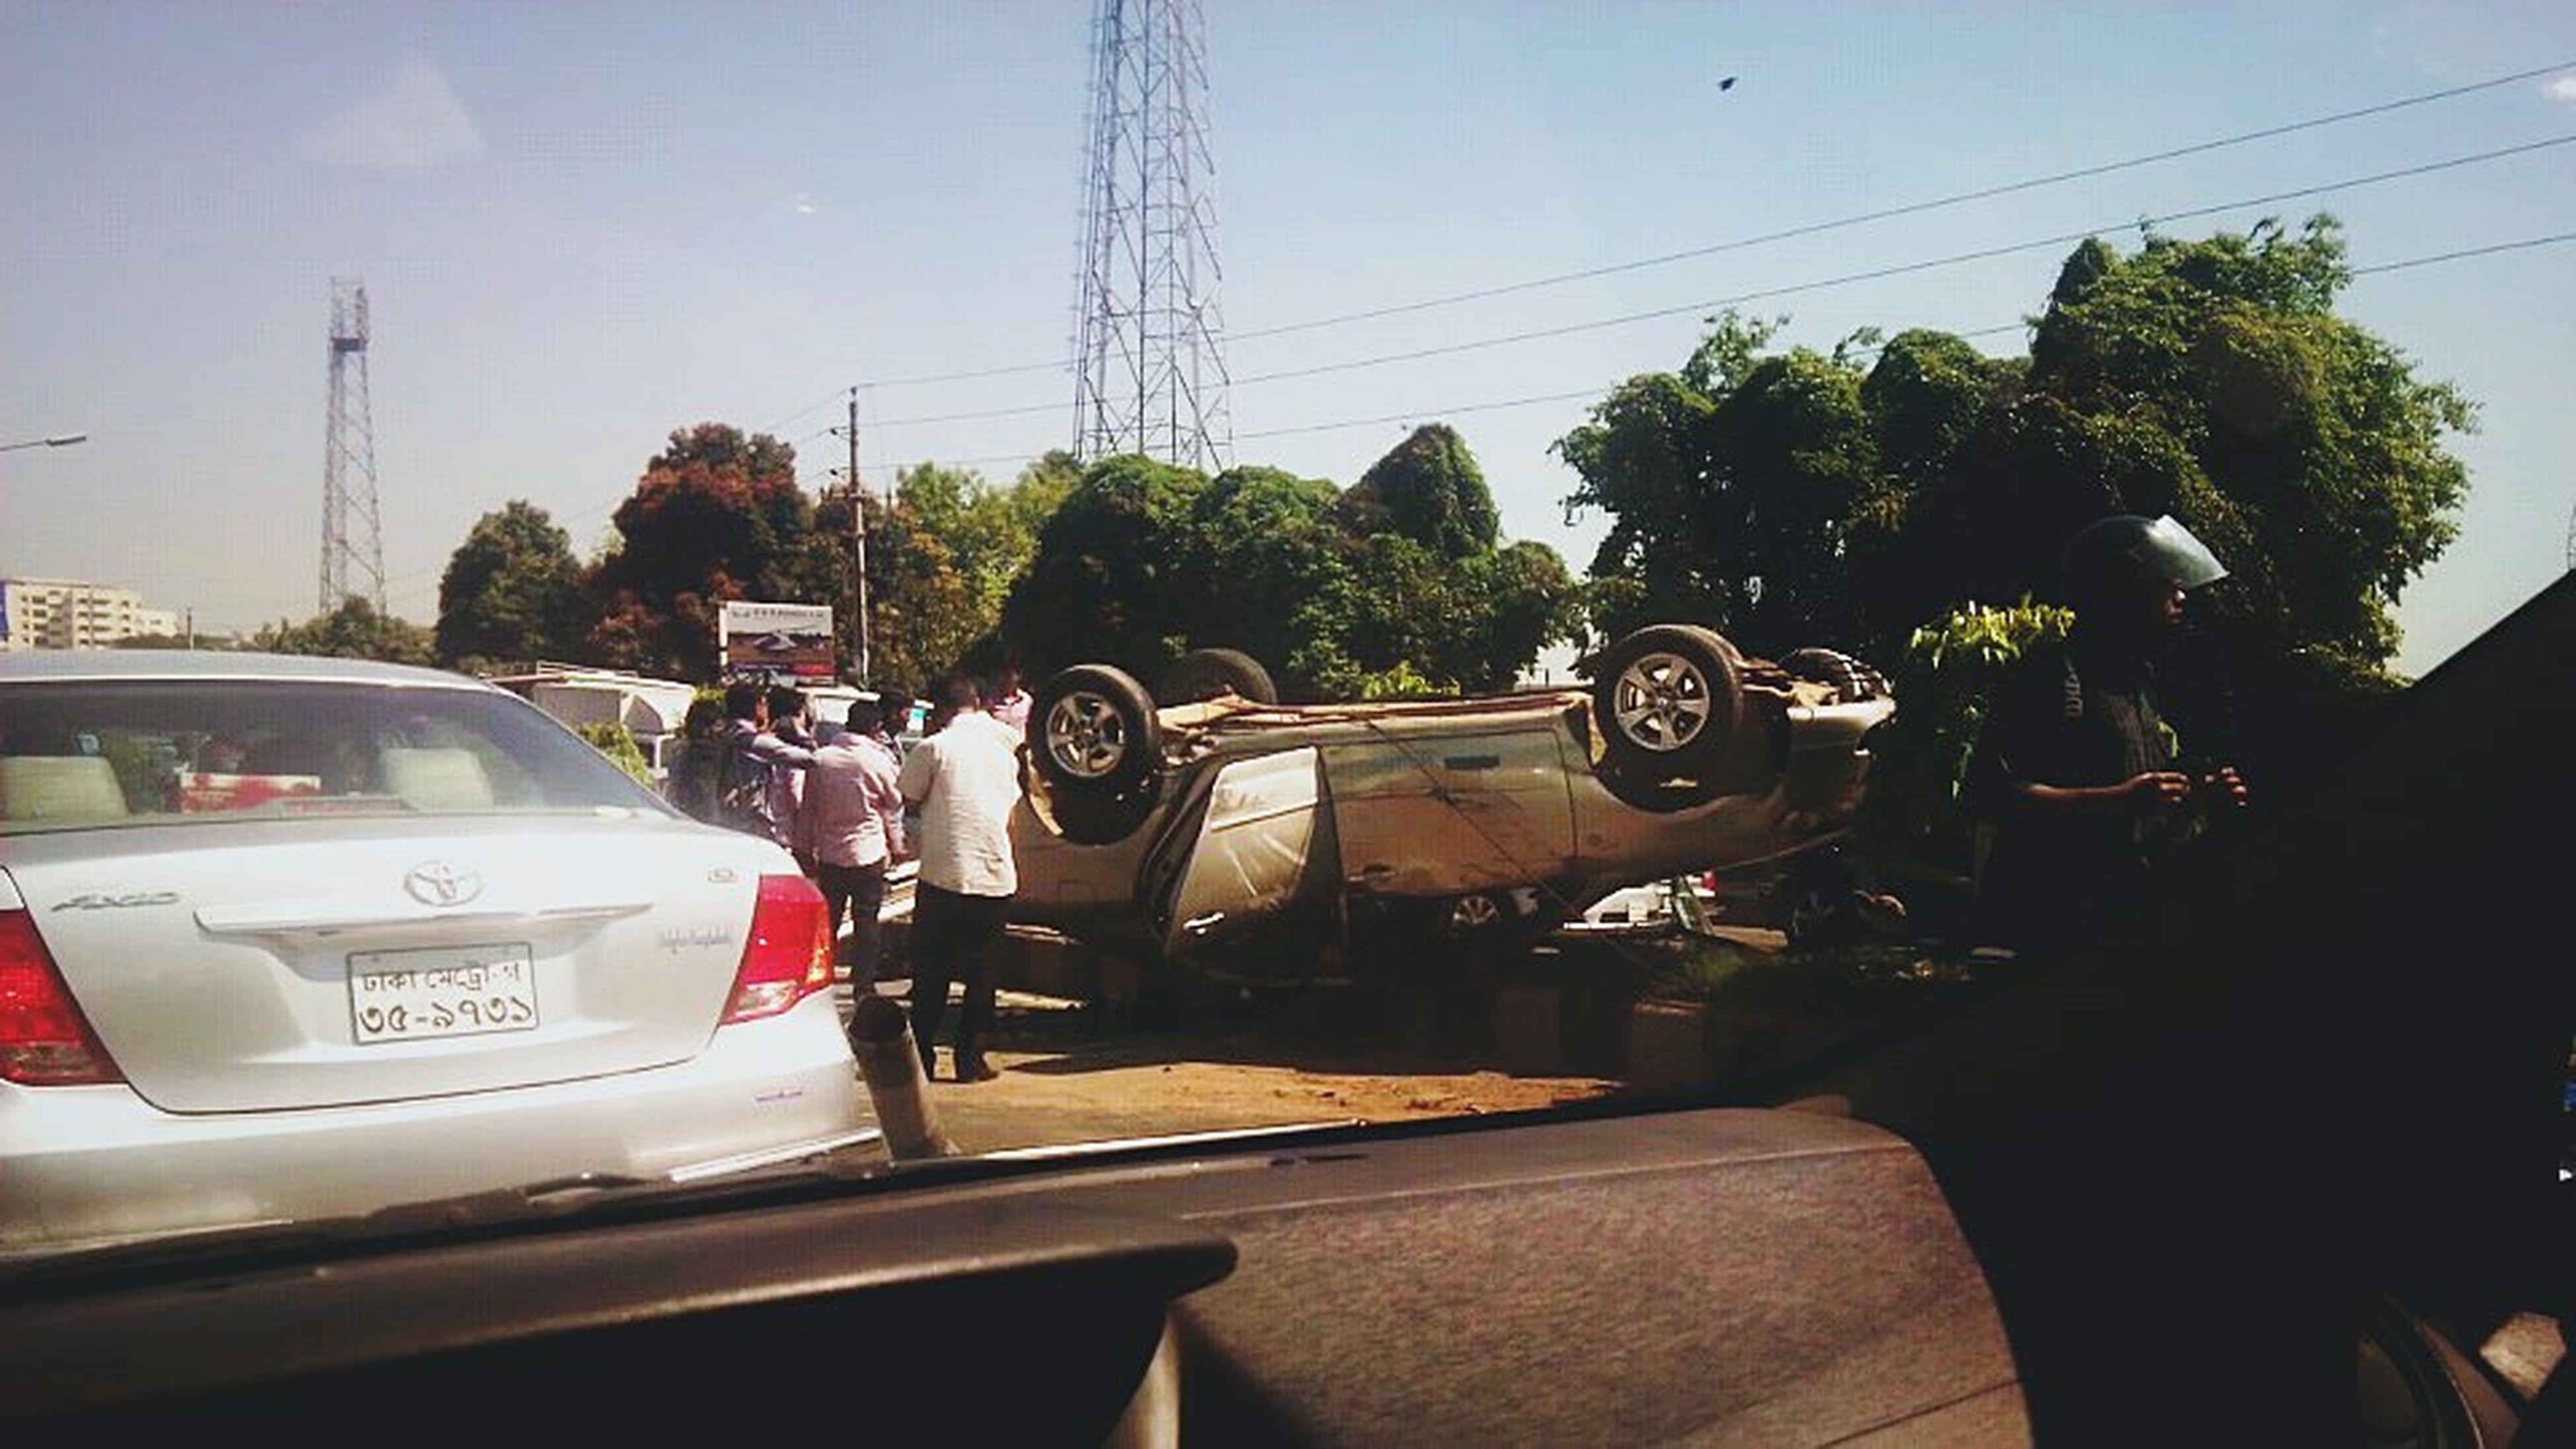 Carcrash Accident